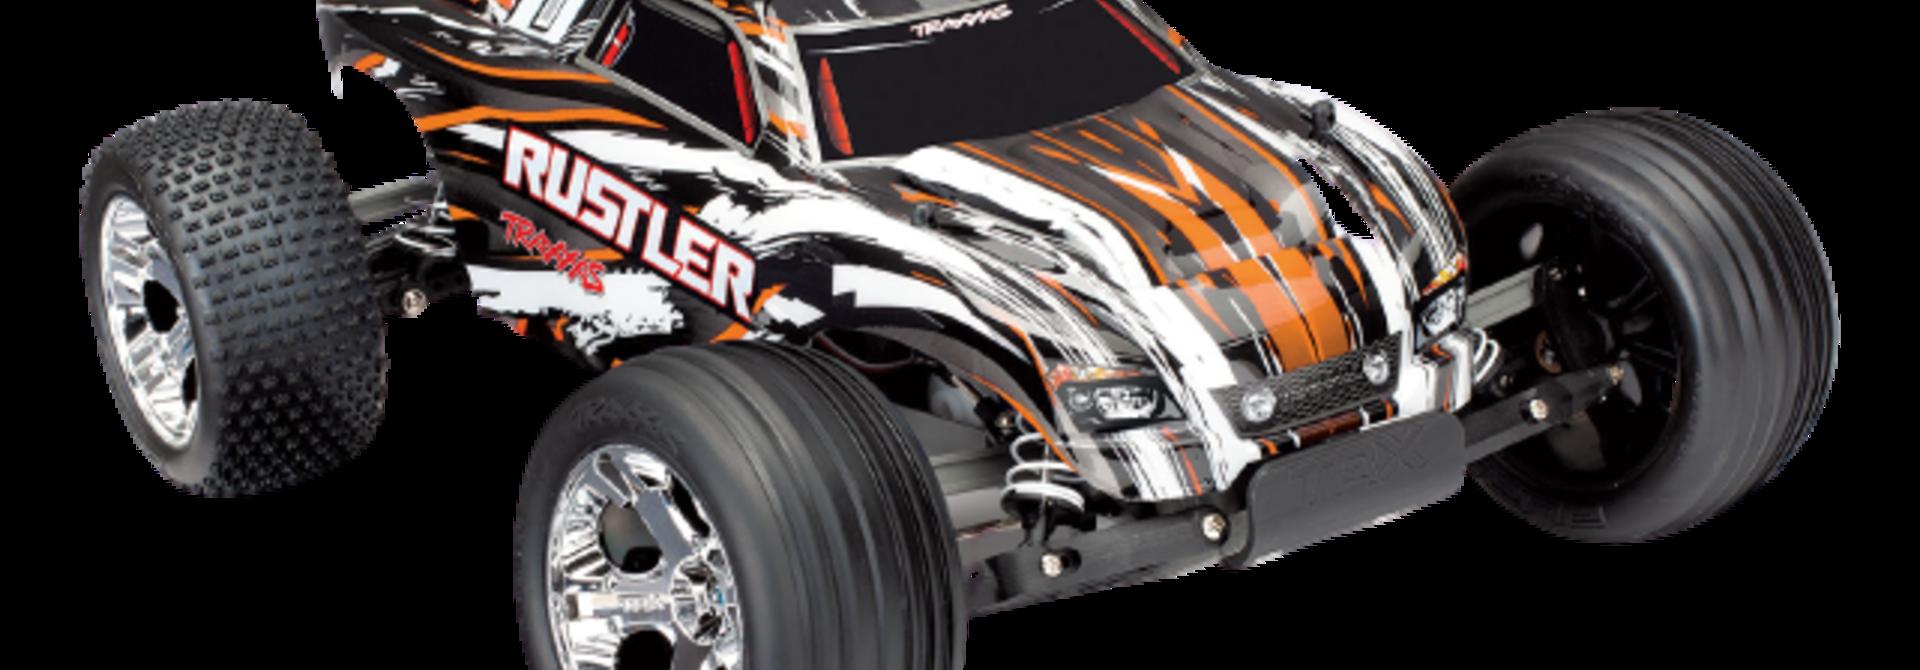 Traxxas Rustler XL-5 TQ (incl battery/charger), Orange TRX37054-1O